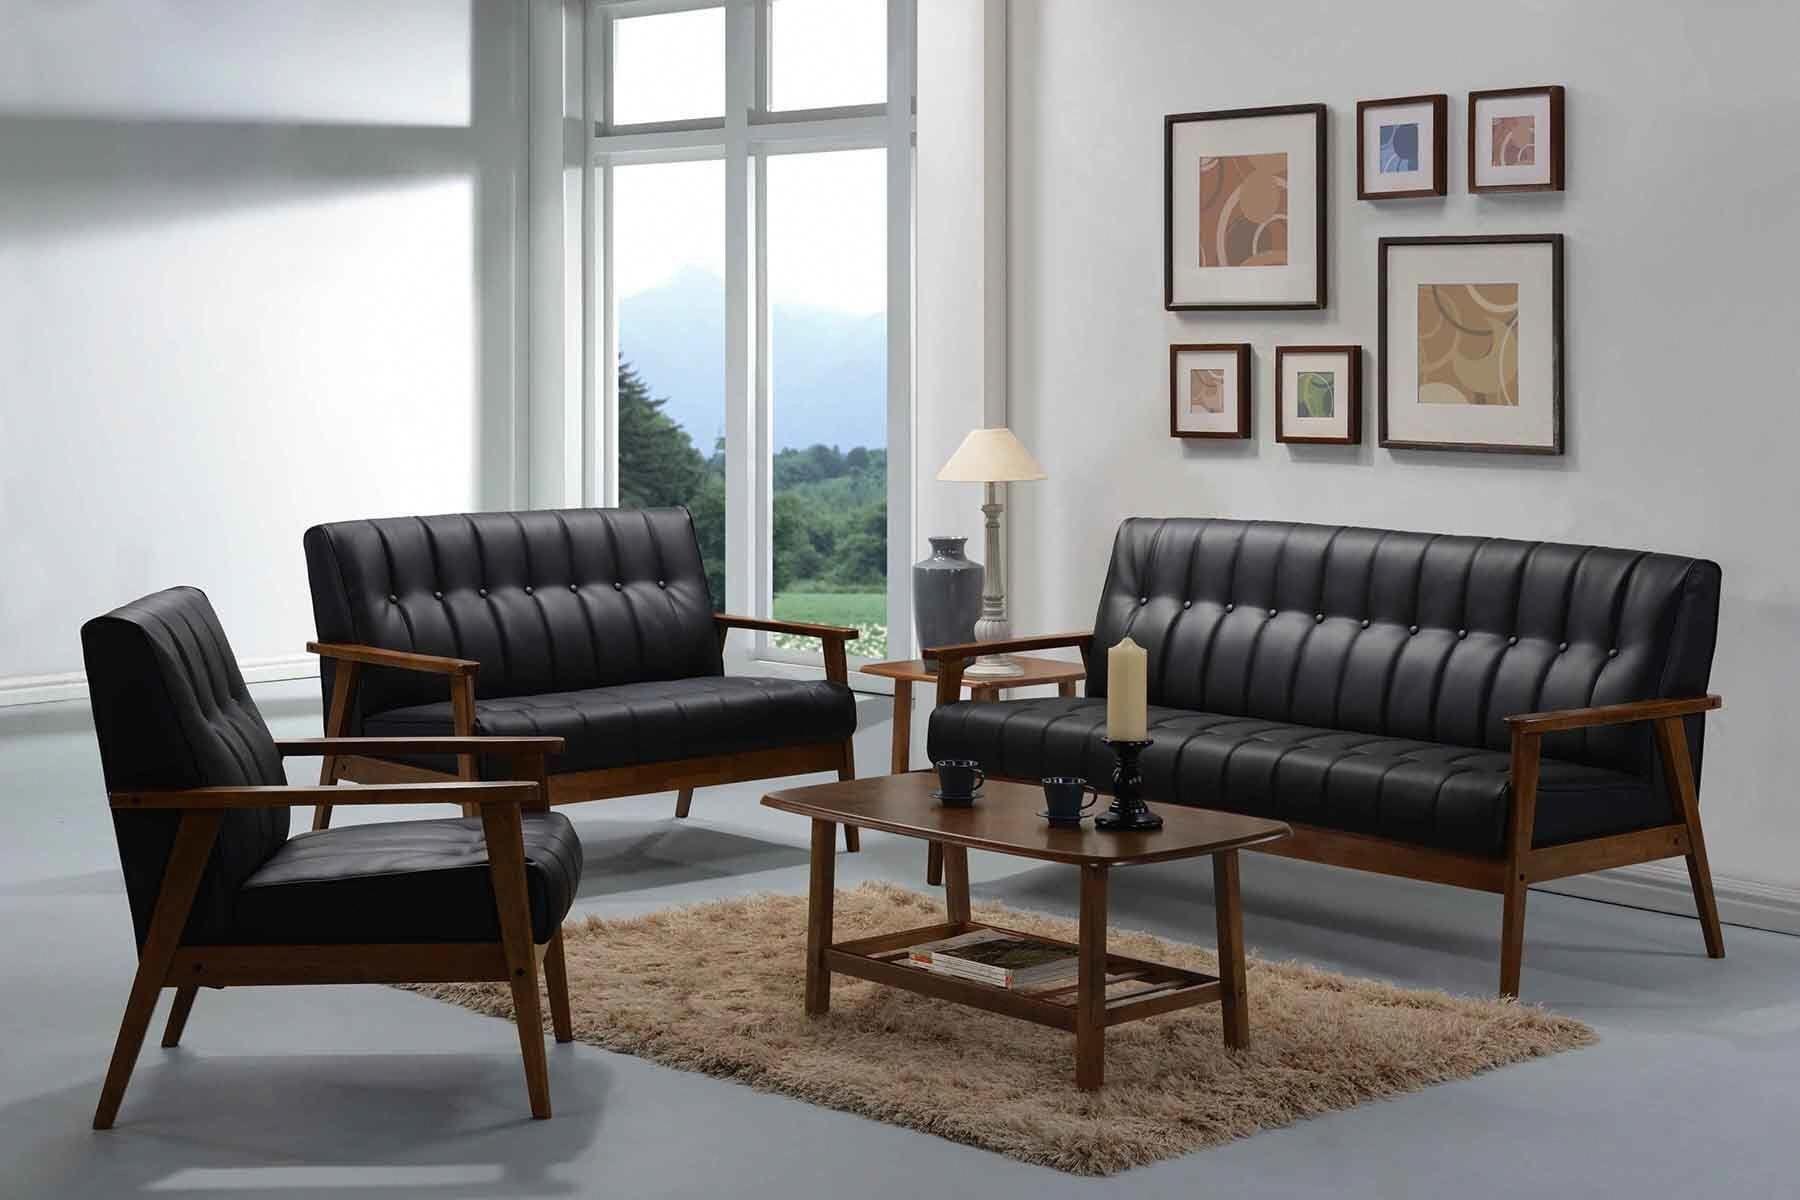 Irish country furniture mobiliárioprimitivo Cheap